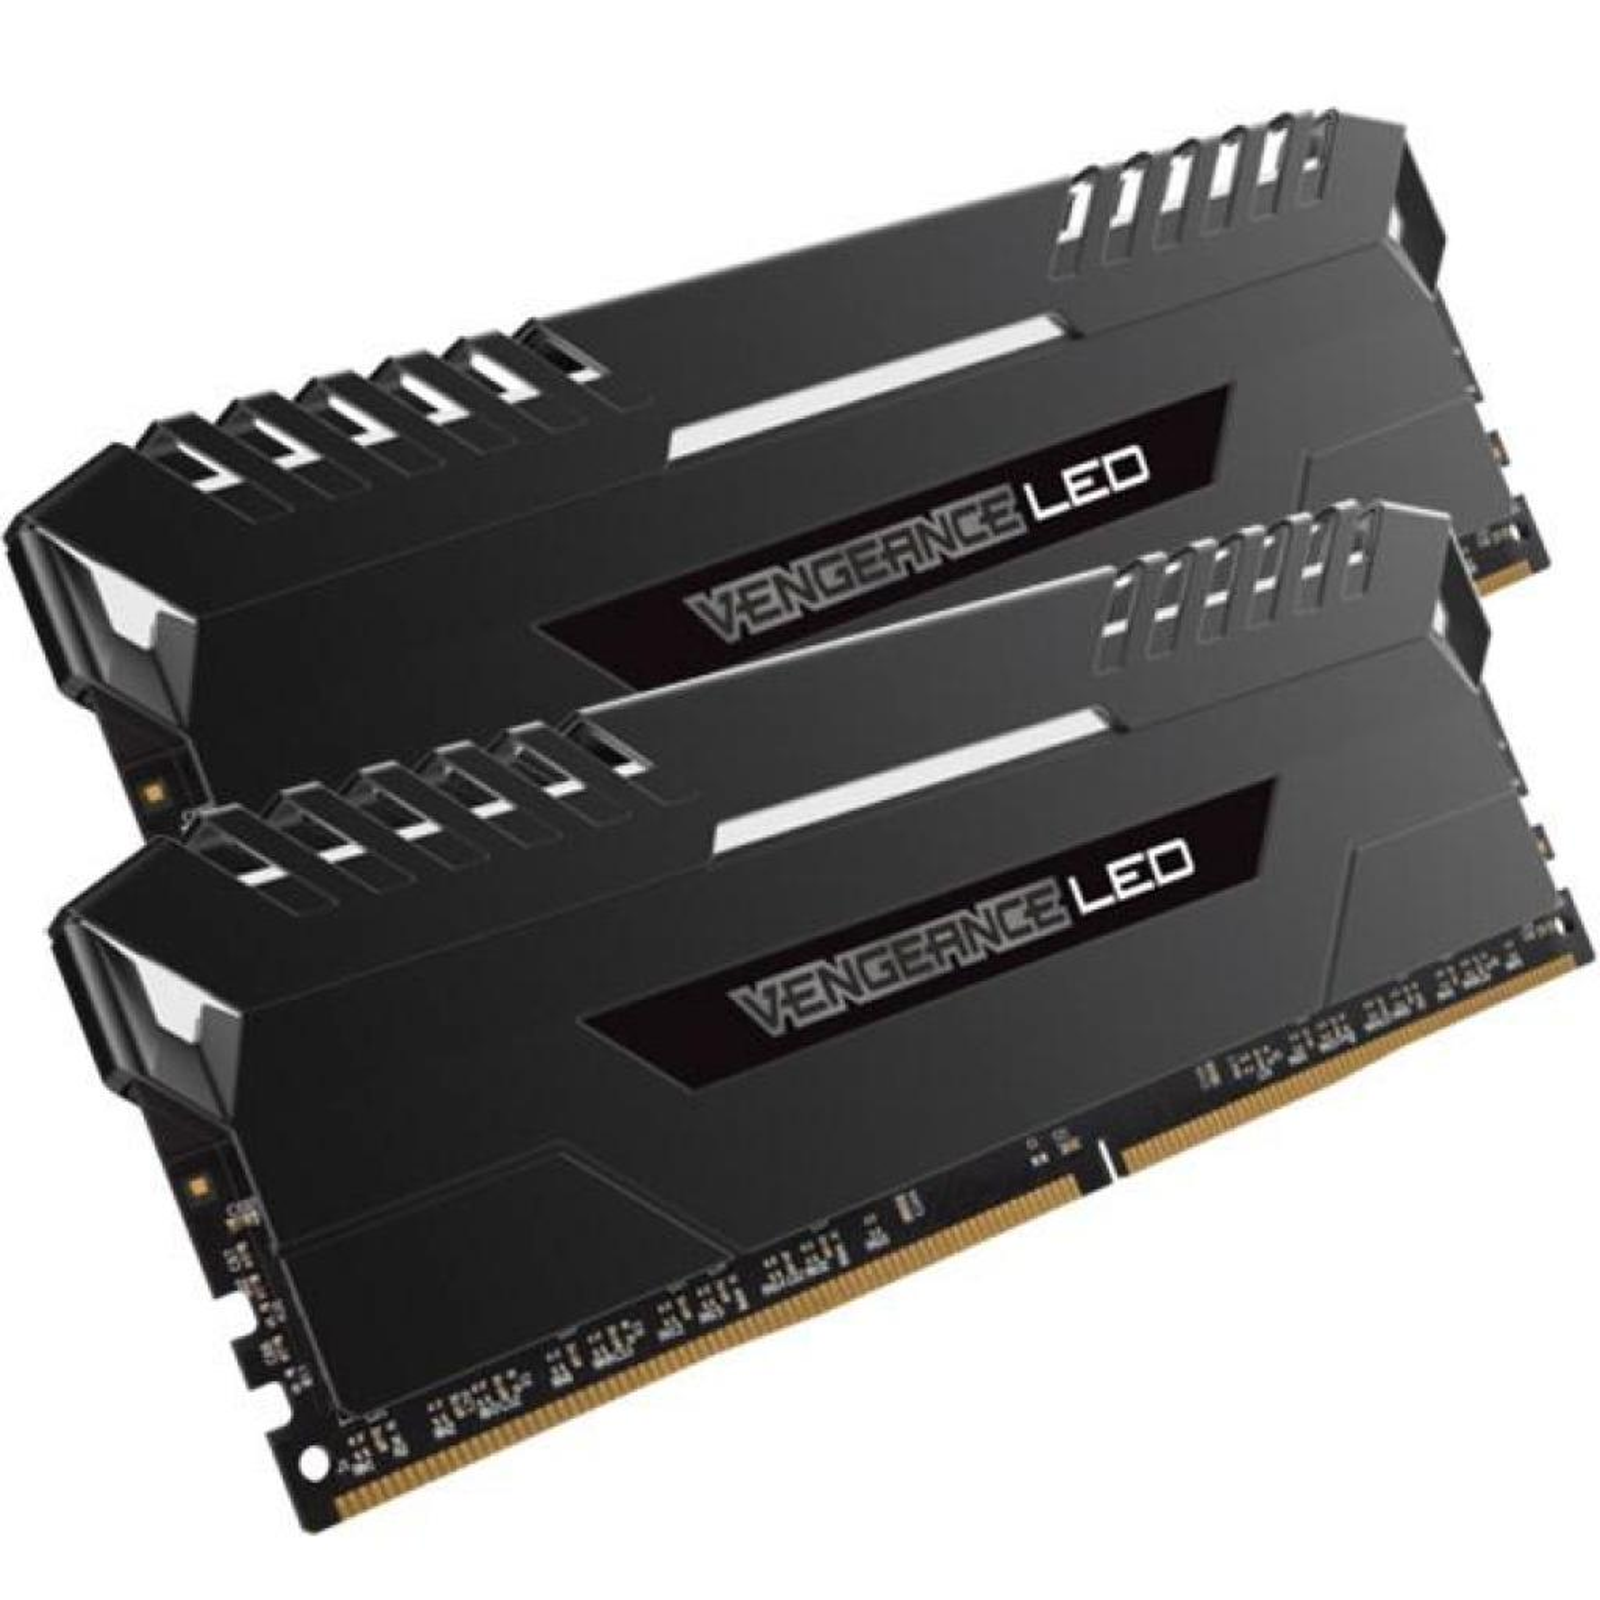 Модуль памяти для компьютера DDR4 16GB (2x8GB) 3000 MHz Vengeance LED White CORSAIR (CMU16GX4M2C3000C15) изображение 2